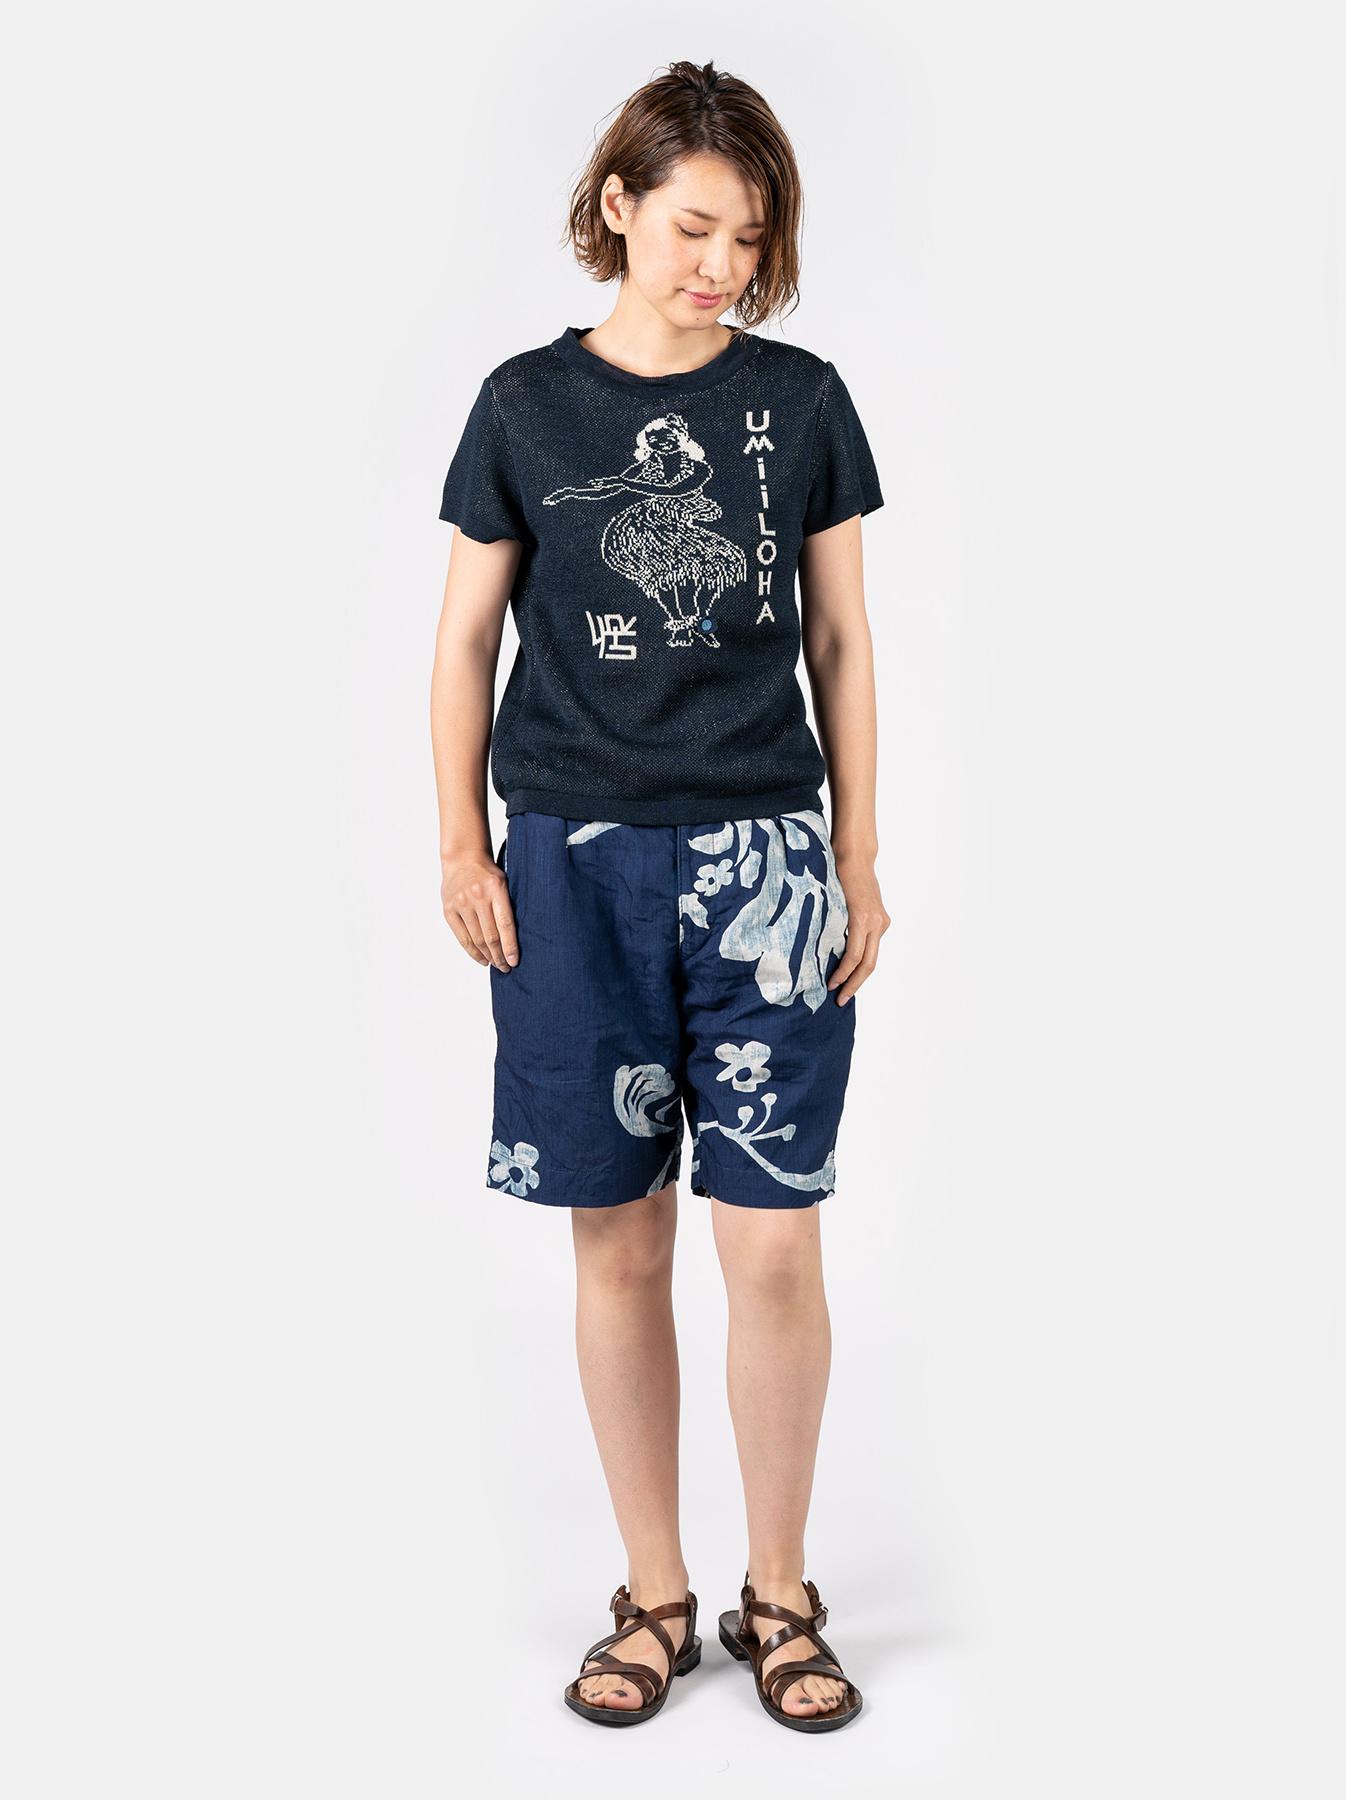 WH Indigo Linen Umiiloha 908 Short Pants-6